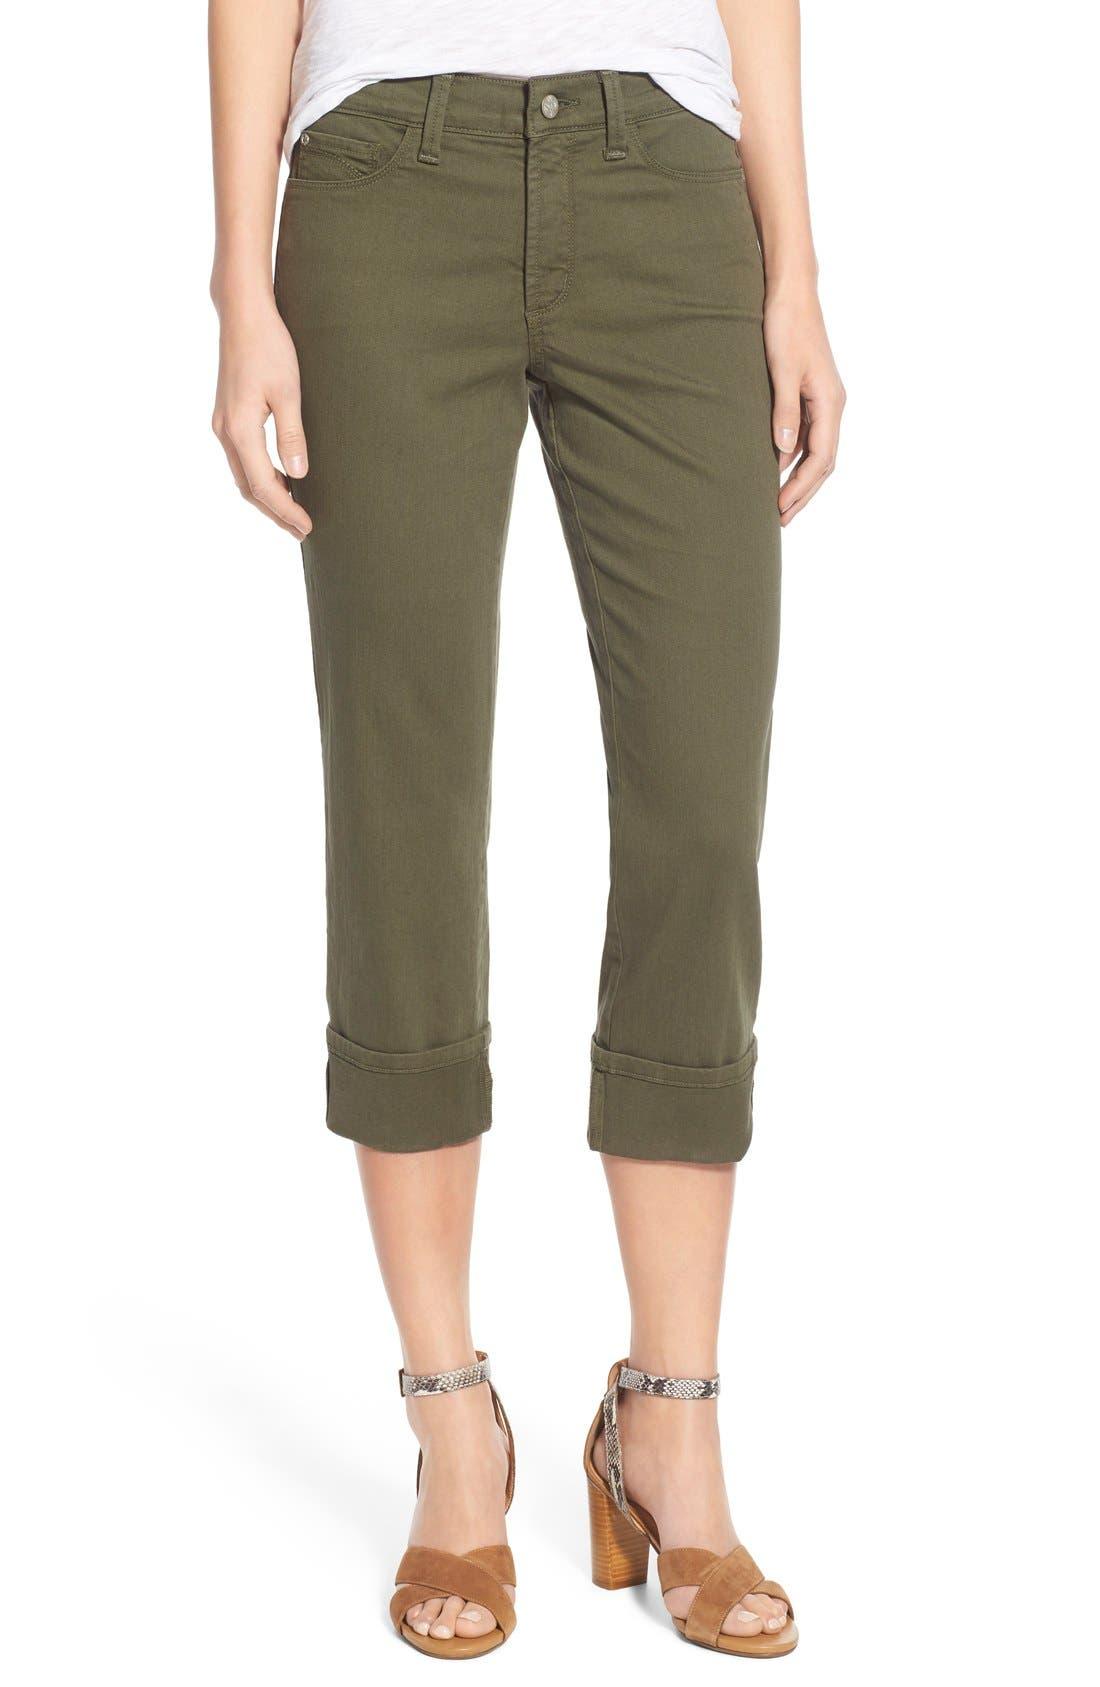 'Dayla' Colored Wide Cuff Capri Jeans,                             Main thumbnail 5, color,